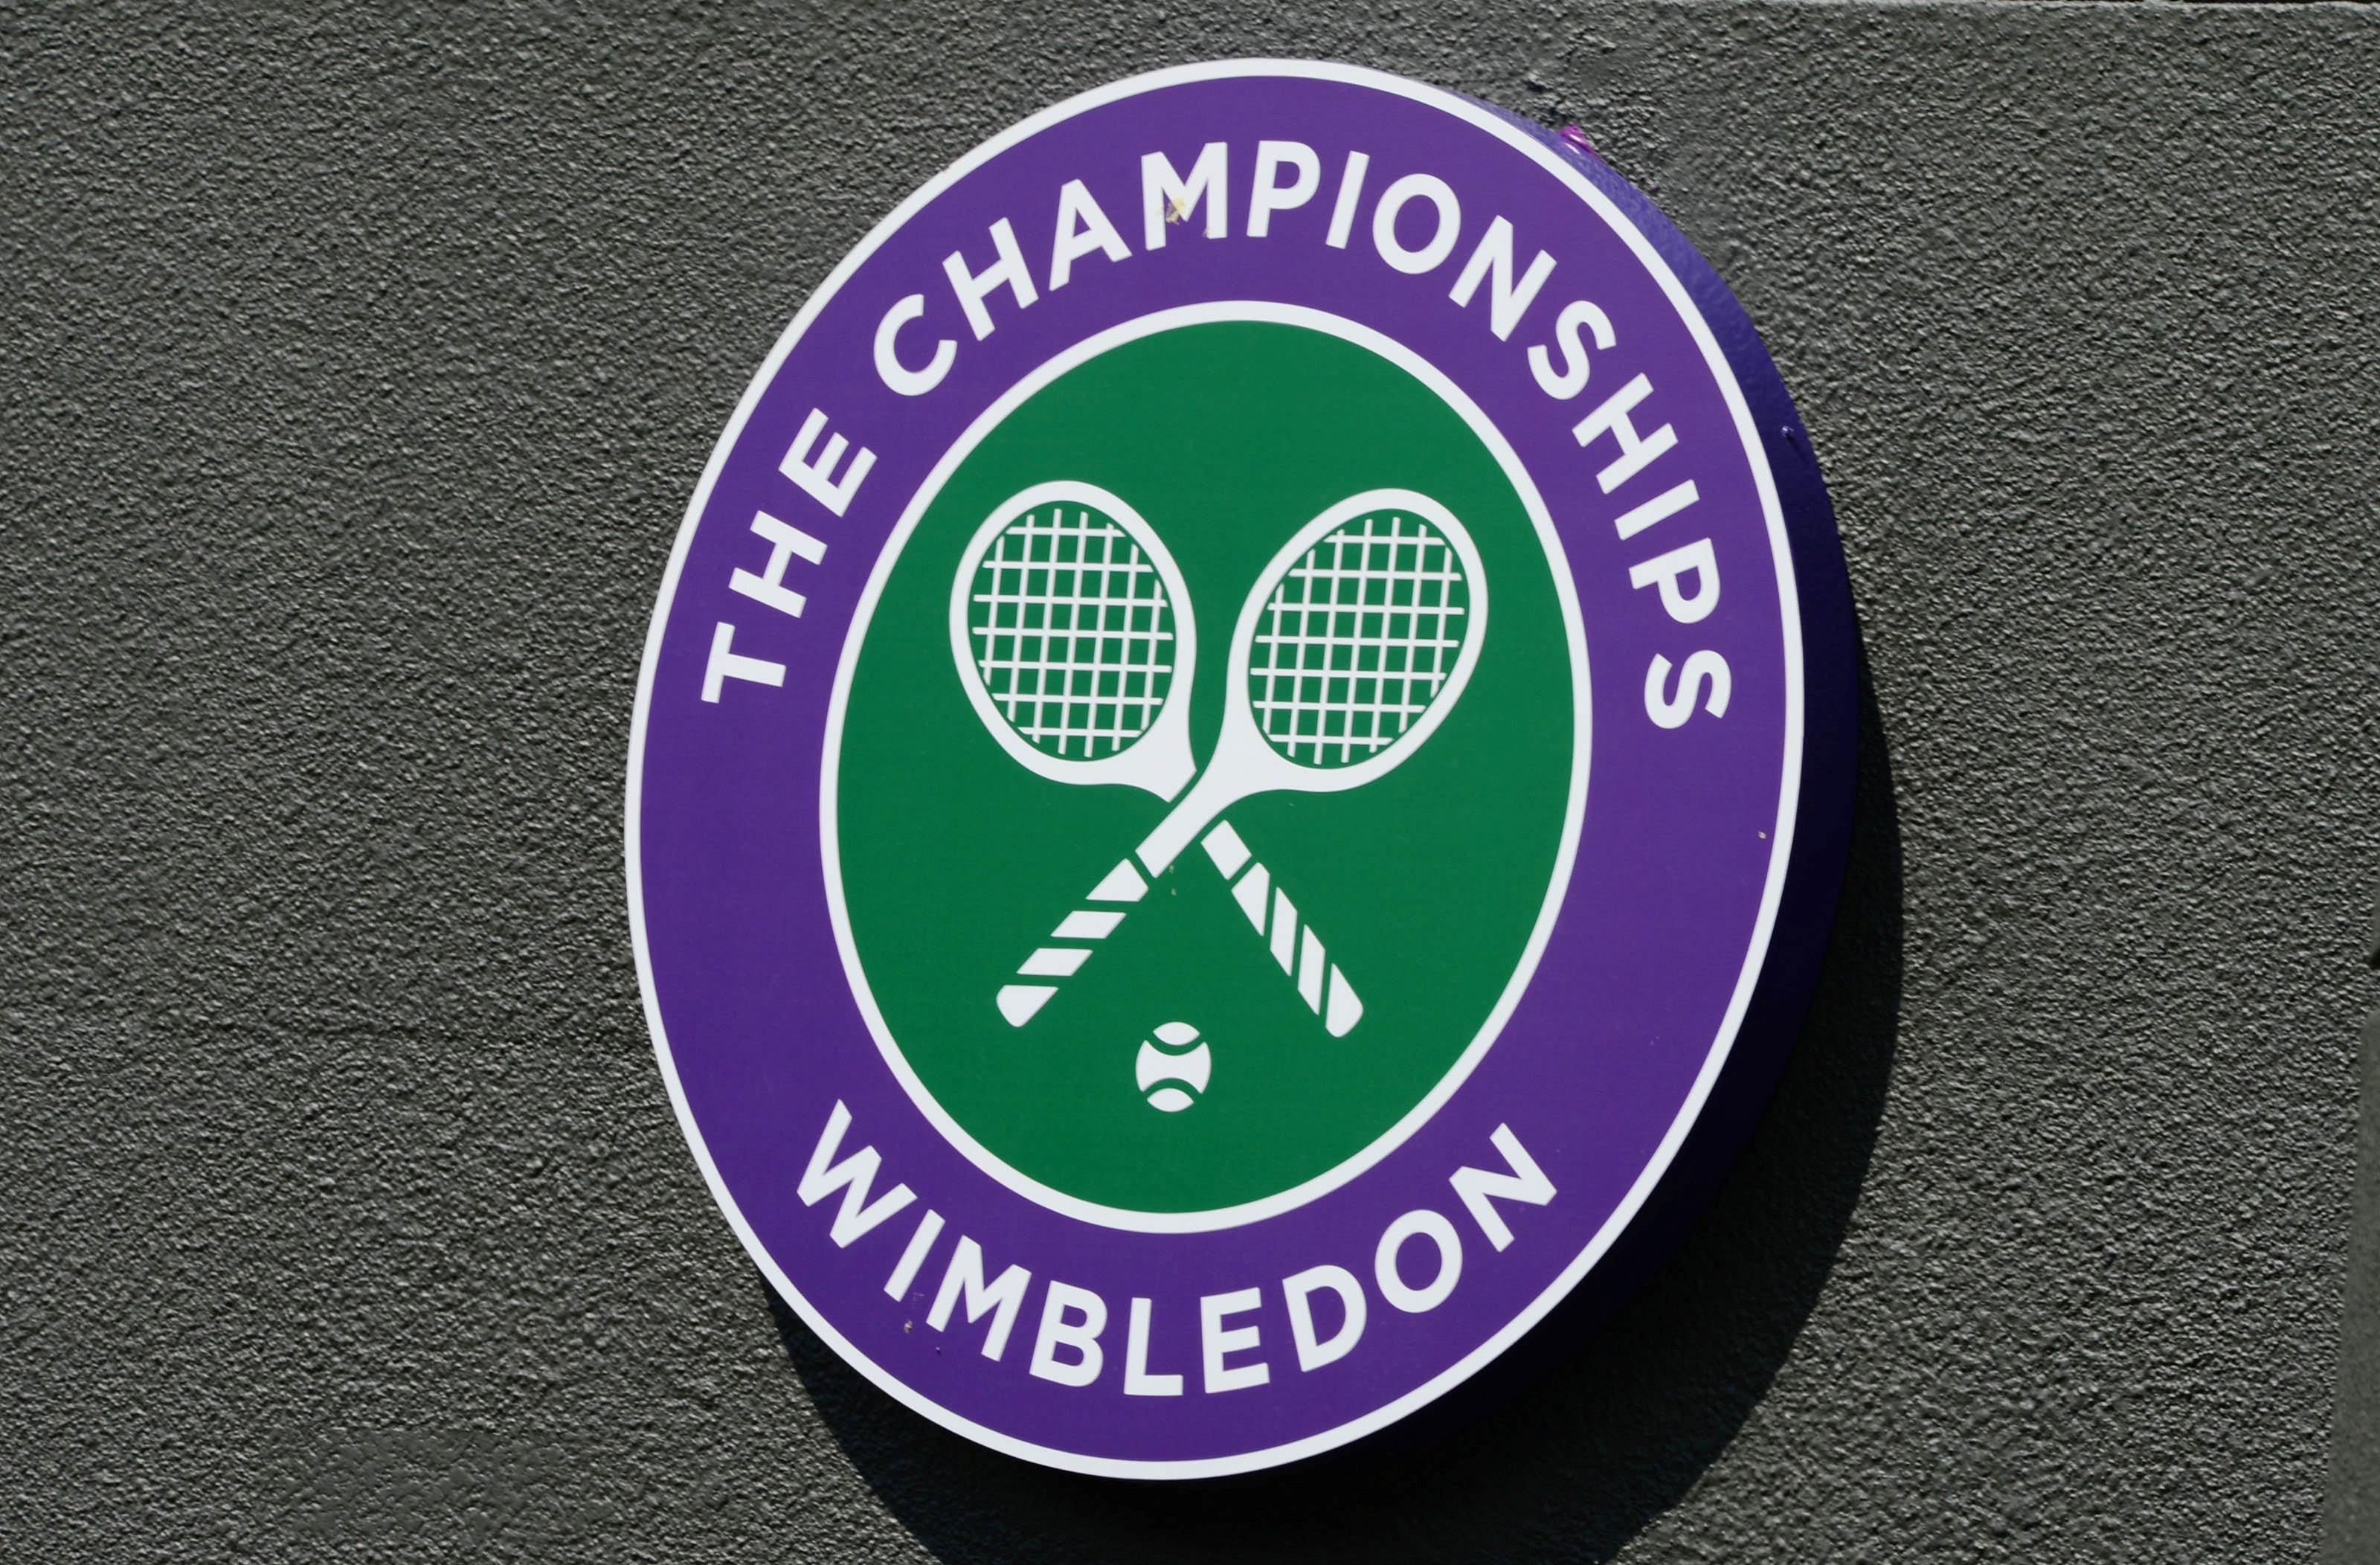 Tennis: Wimbledon to crack down on treatment of ball kids